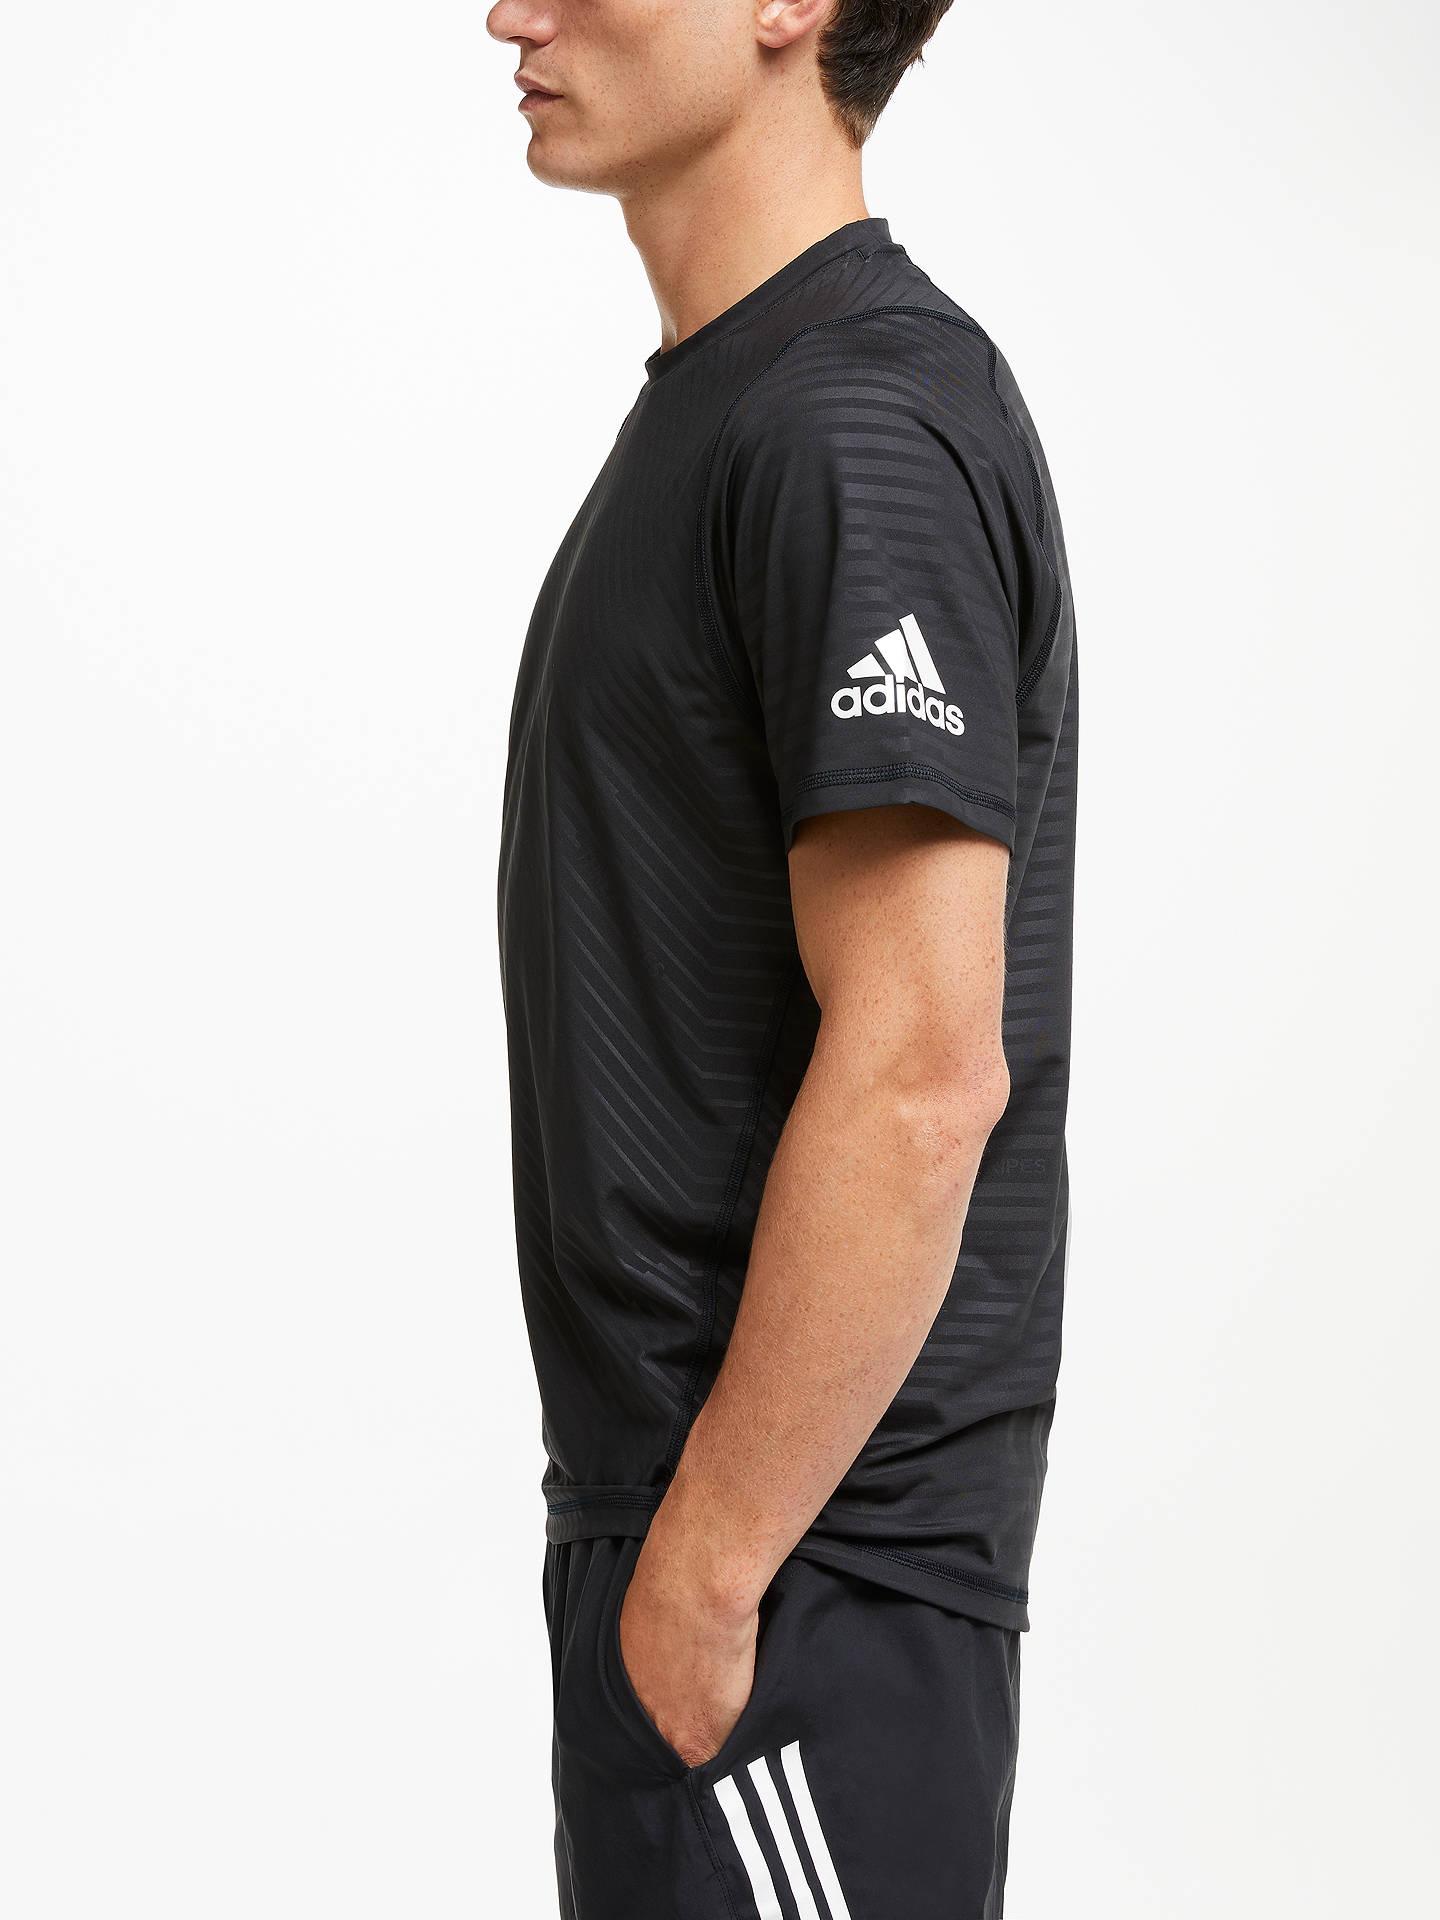 años cristiandad pegar  adidas FreeLift 360 Subtle Graphic Training T-Shirt, Black at John Lewis &  Partners